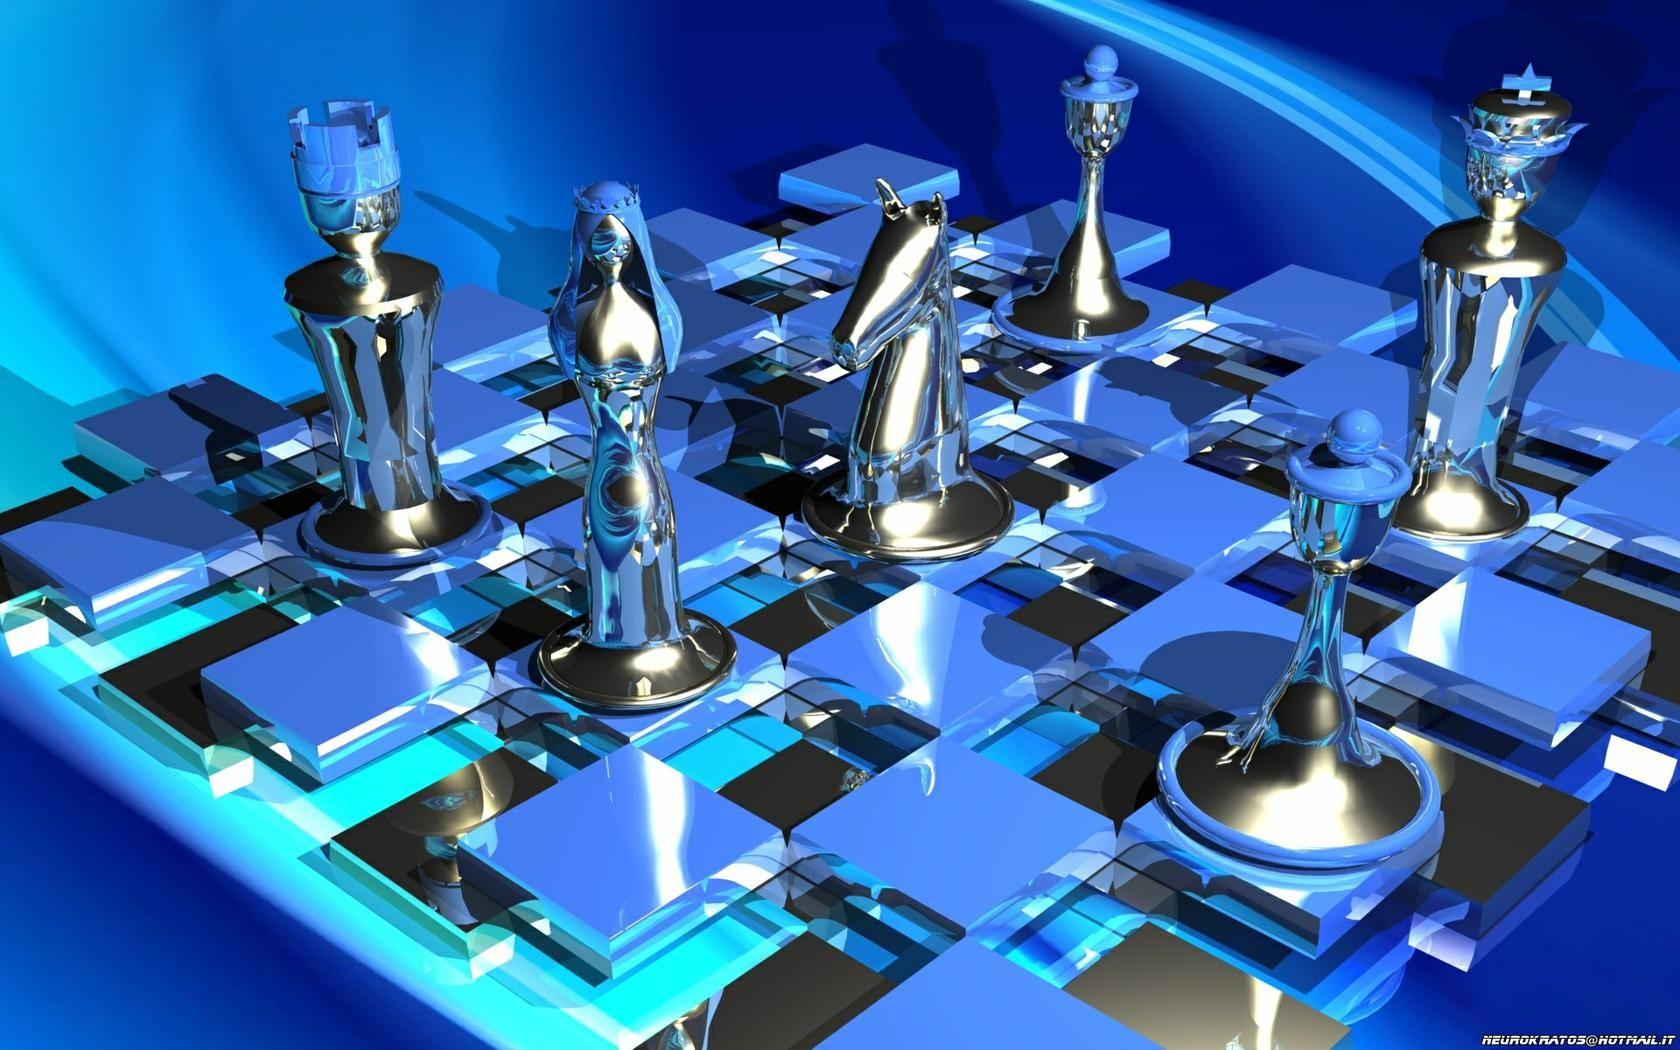 K ultra hd chess wallpapers hd desktop backgrounds 16801050 k ultra hd chess wallpapers hd desktop backgrounds 16801050 chessboard wallpapers 34 voltagebd Gallery